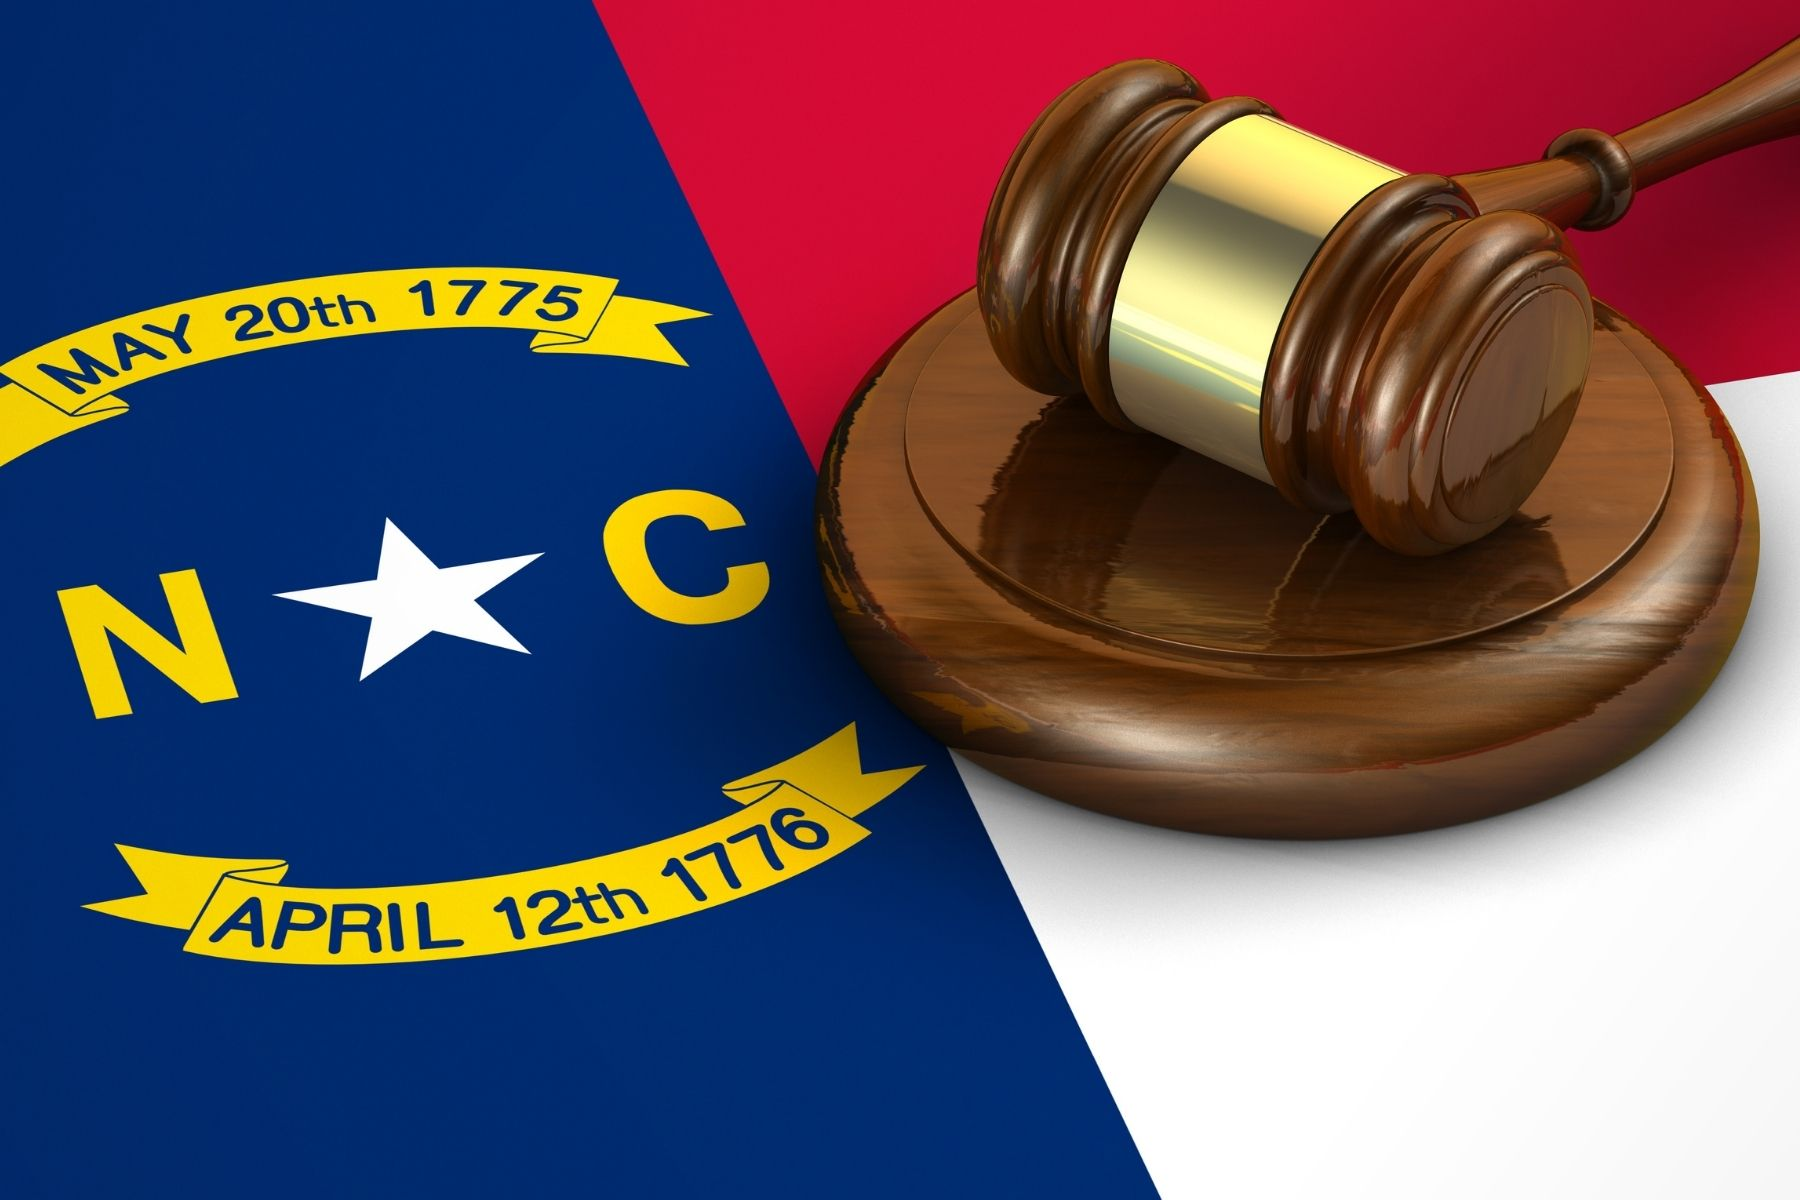 image of gavel and North Carolina flag